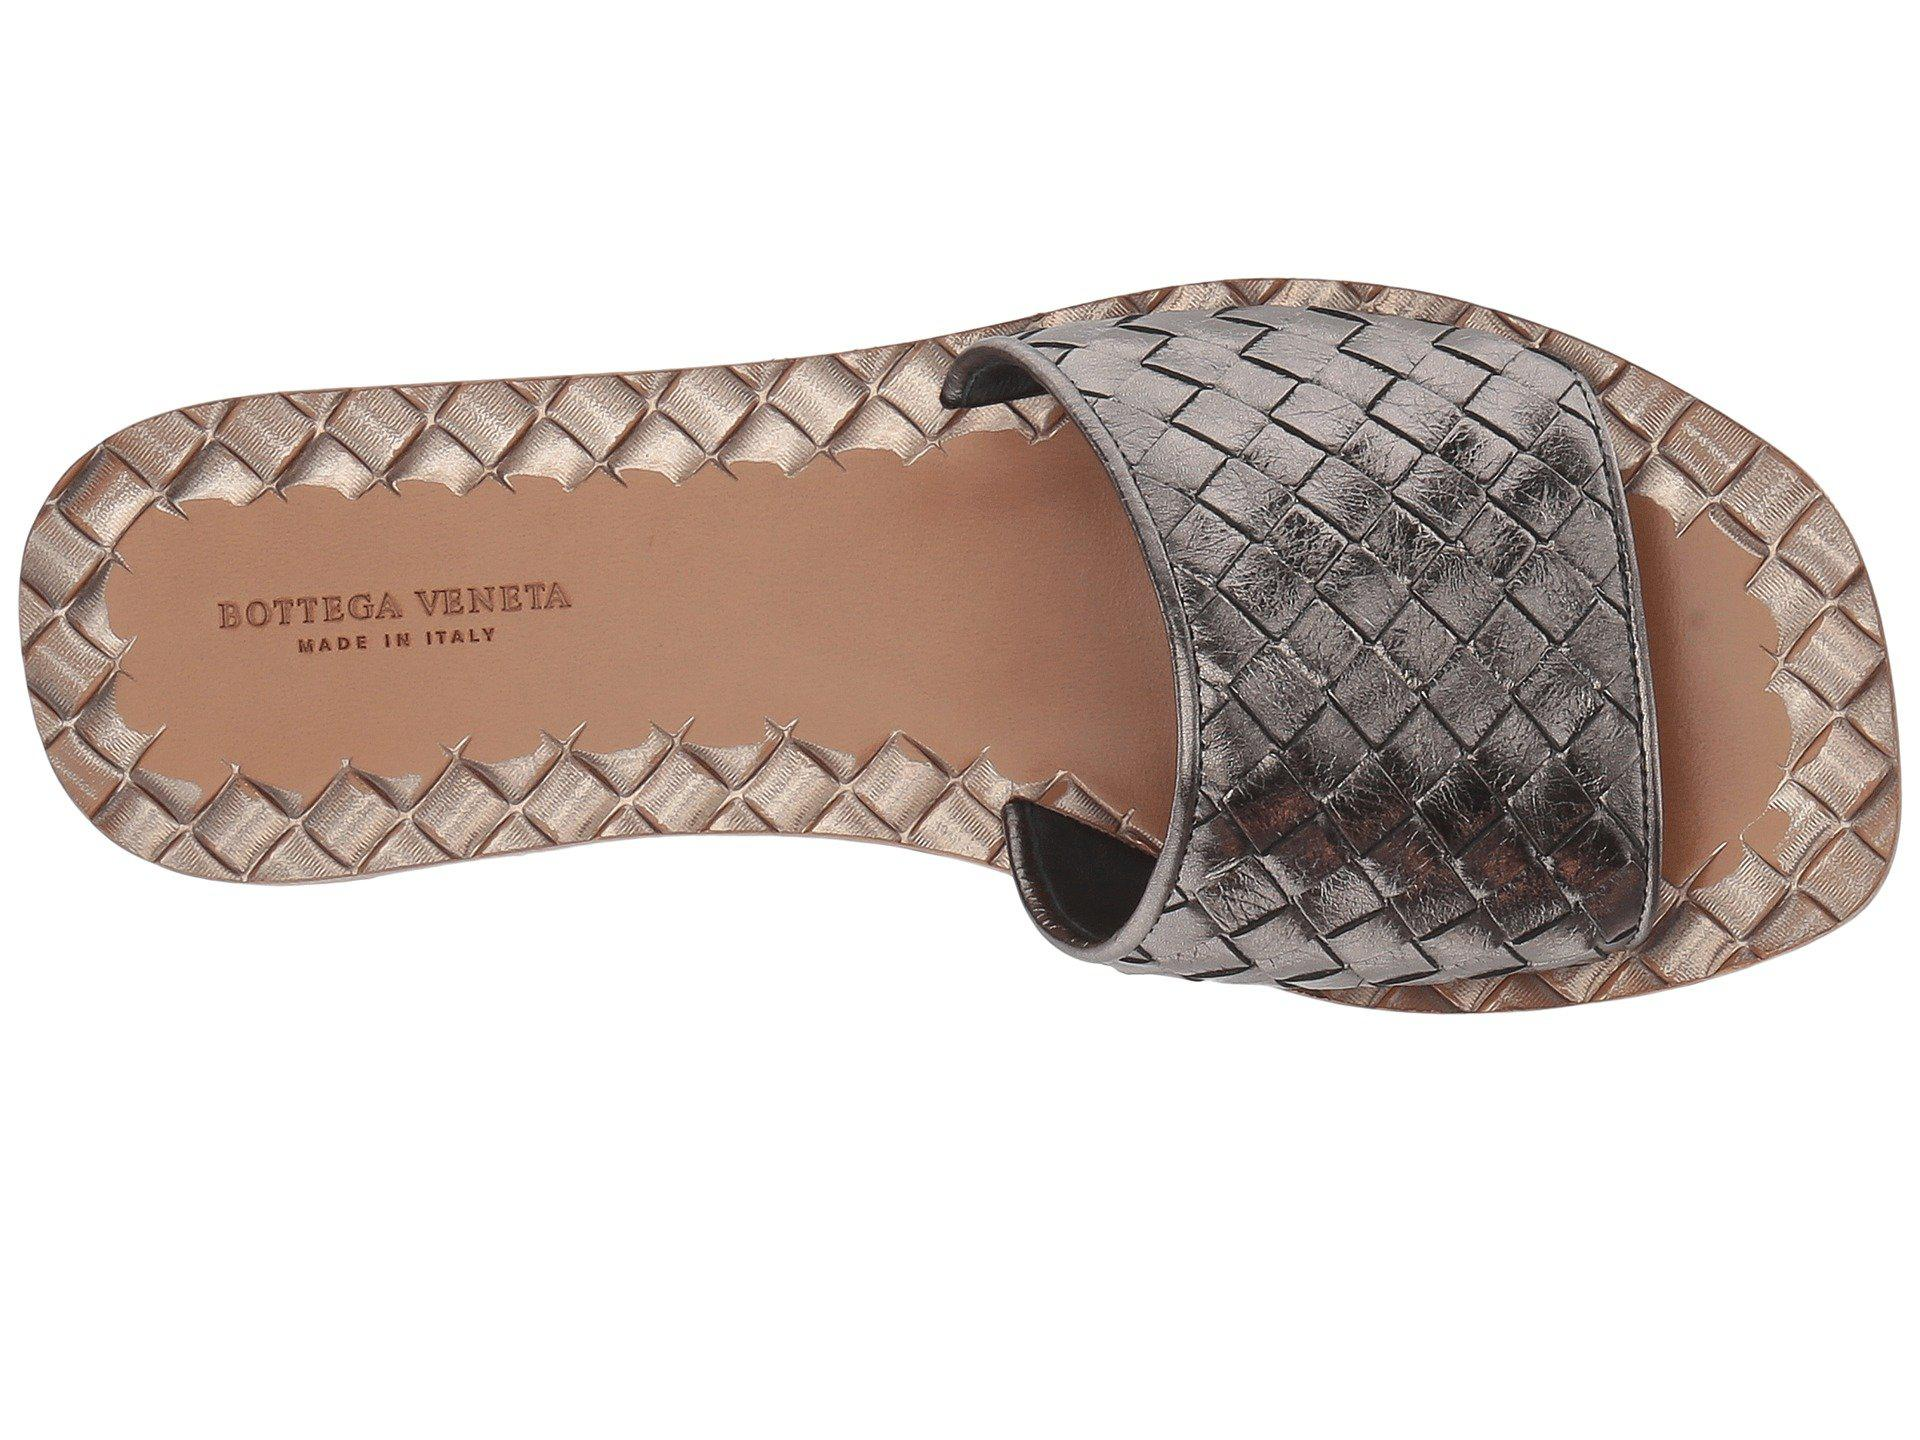 5bc421f09e0588 Bottega Veneta - Metallic Intrecciato Sandal (platinum) Women s Sandals -  Lyst. View fullscreen